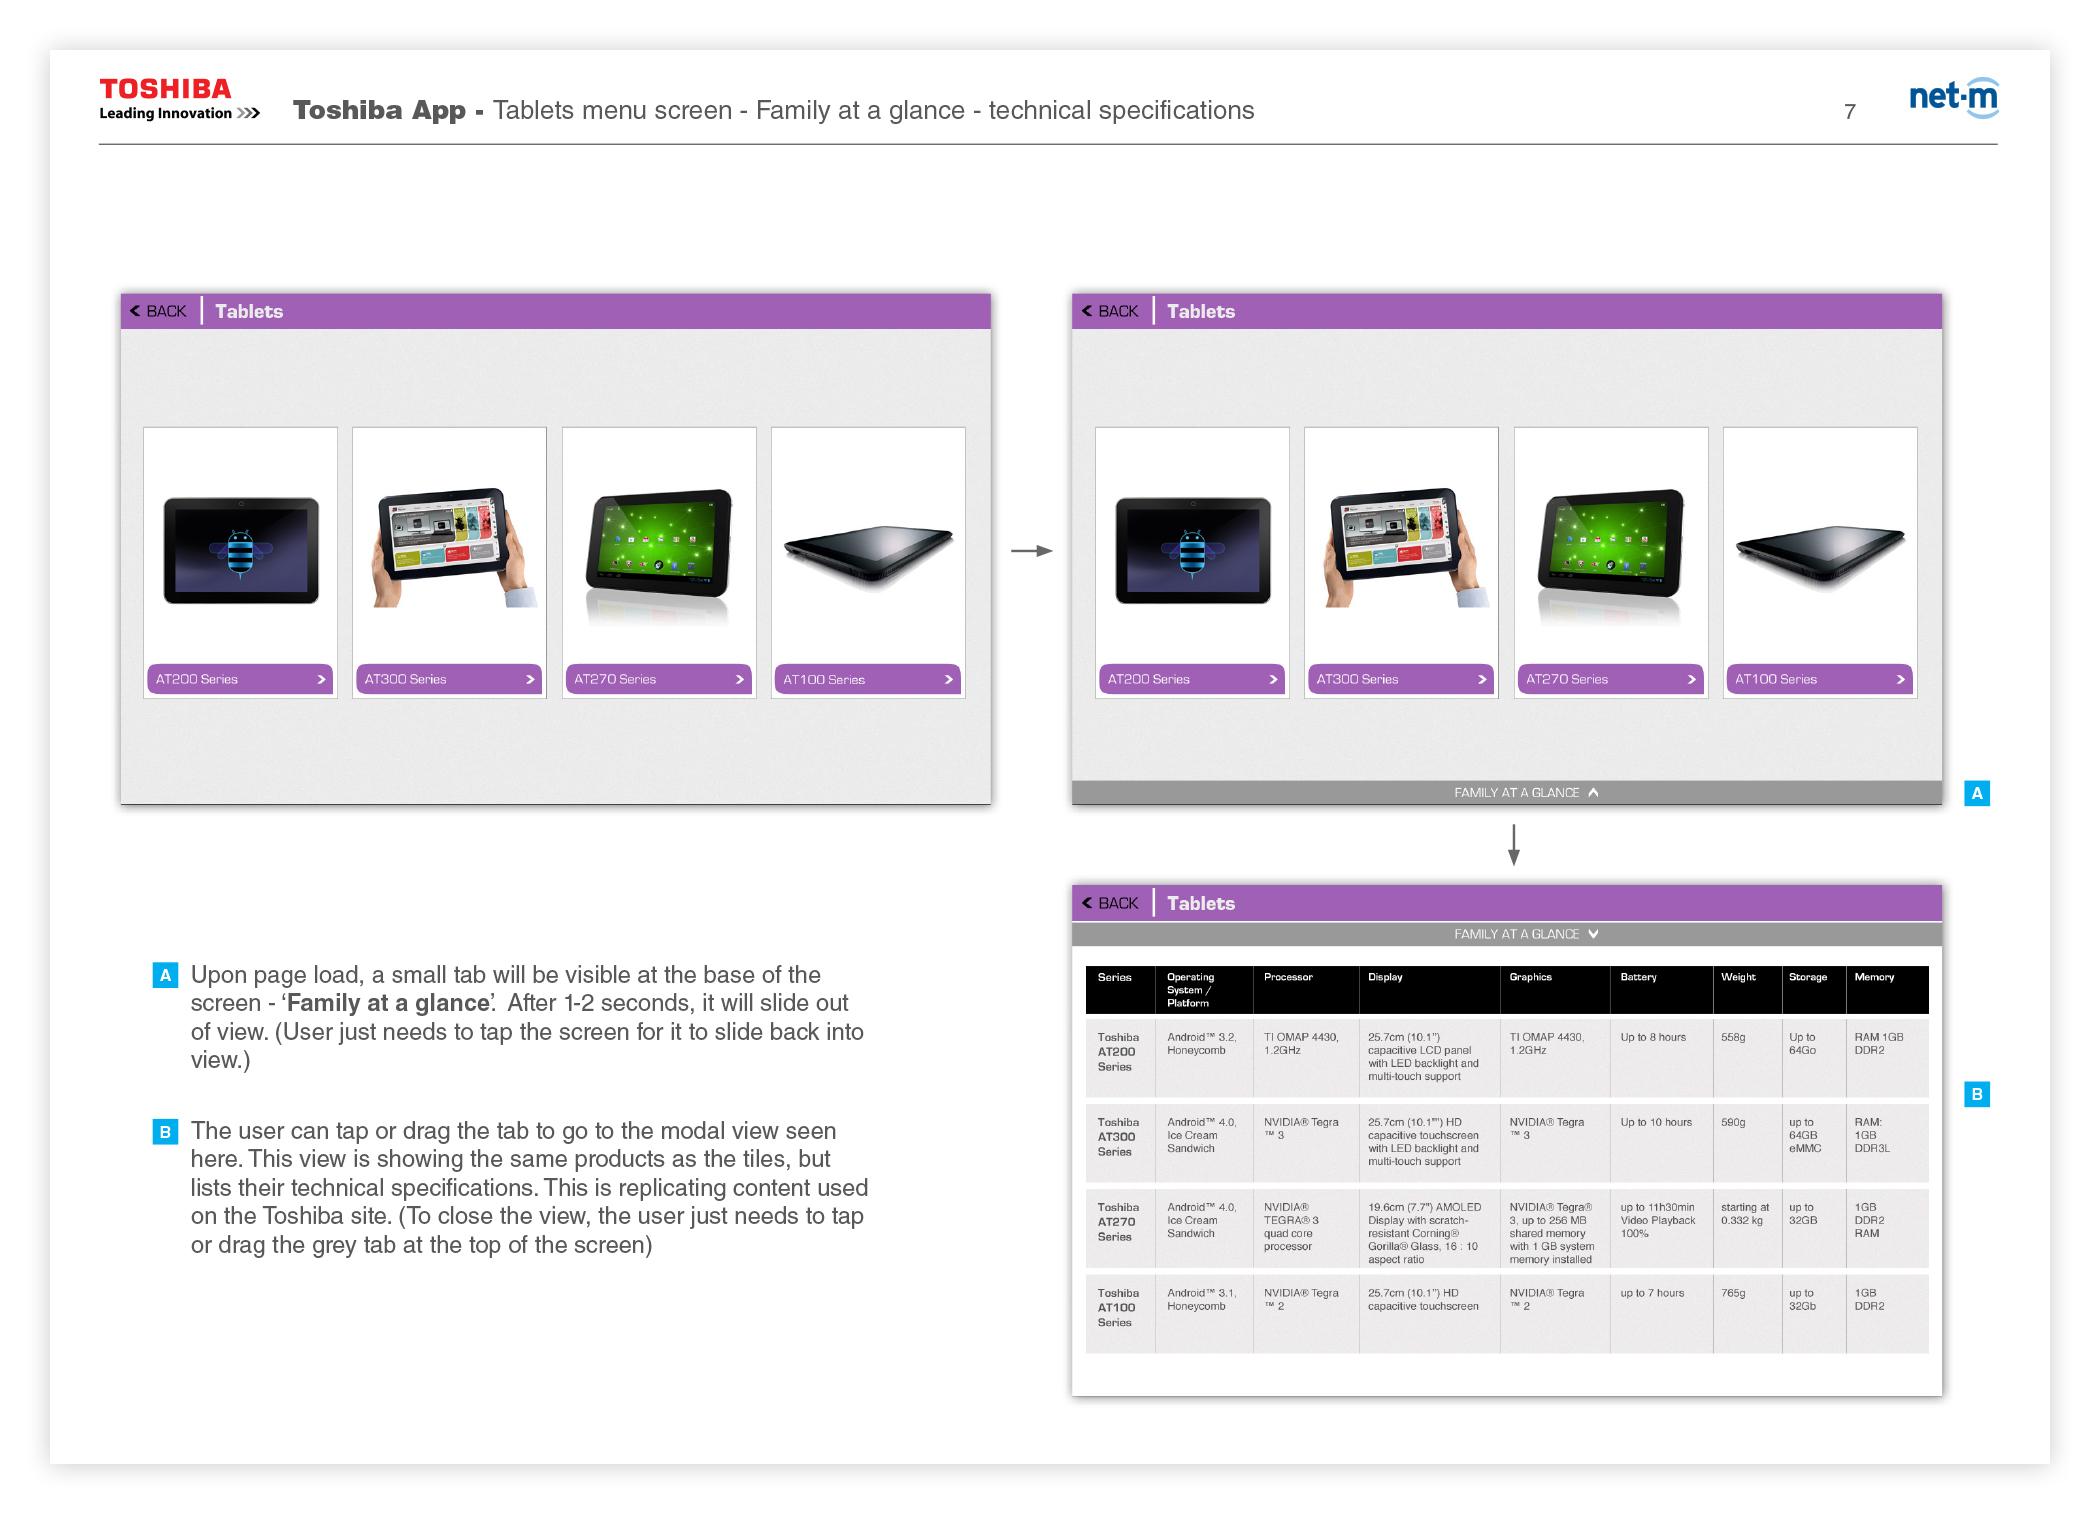 Toshiba_App_presentation_deck4.jpg